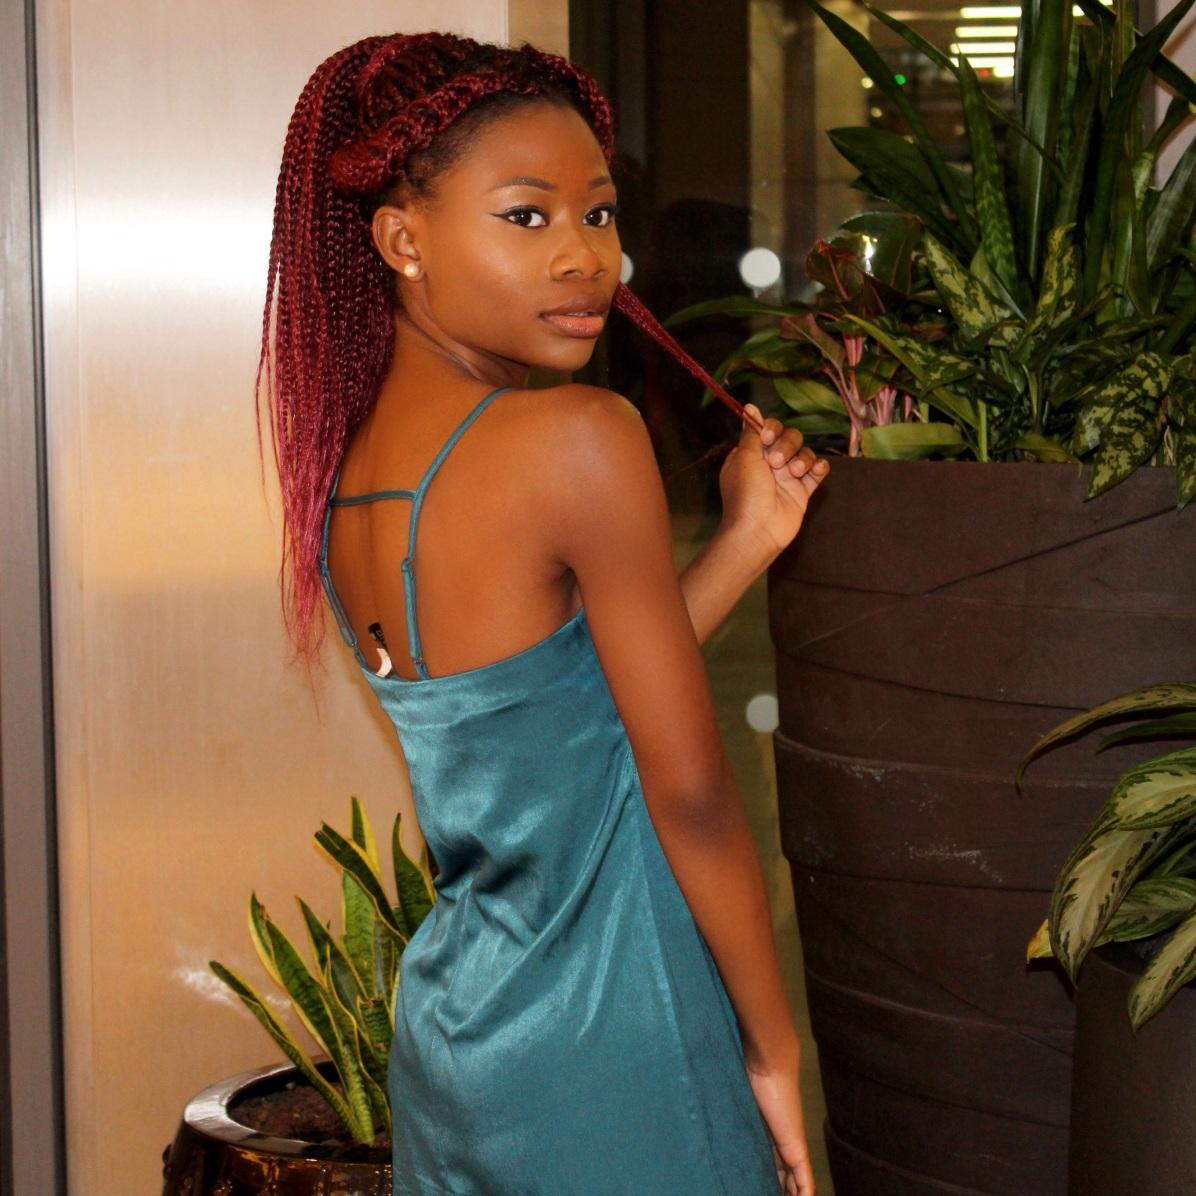 HM H&M London Winter Black Girls Who Blog Petite Bumascloset Jumascloset